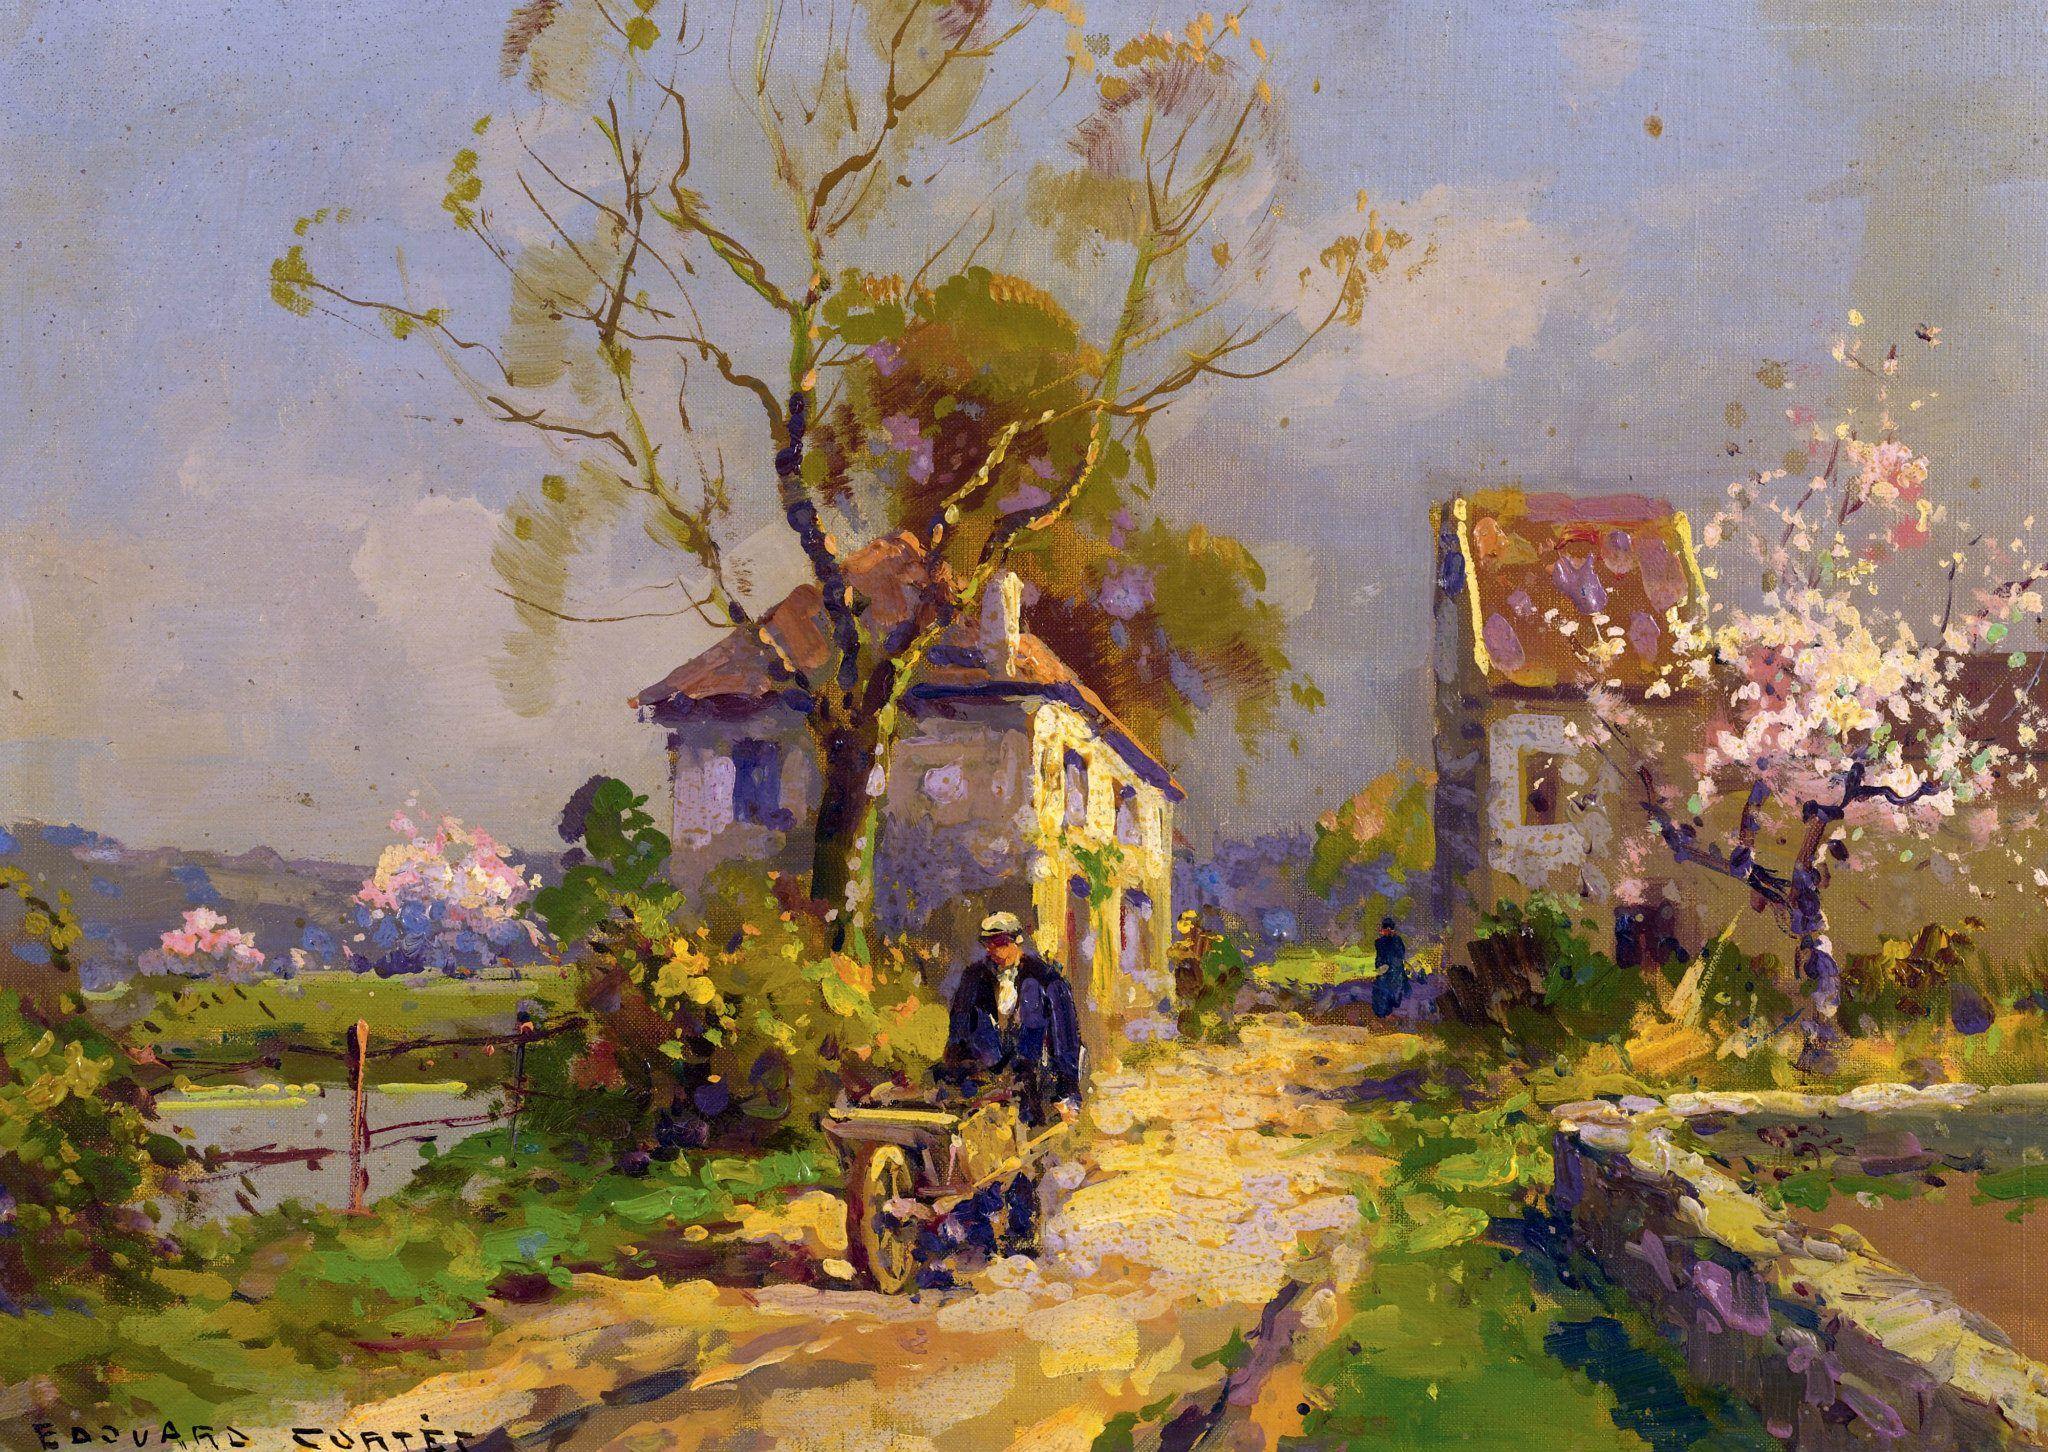 Extrêmement Édouard Leon Cortès (French painter) 1882 – 1969 A Spring Day, oil  IZ49